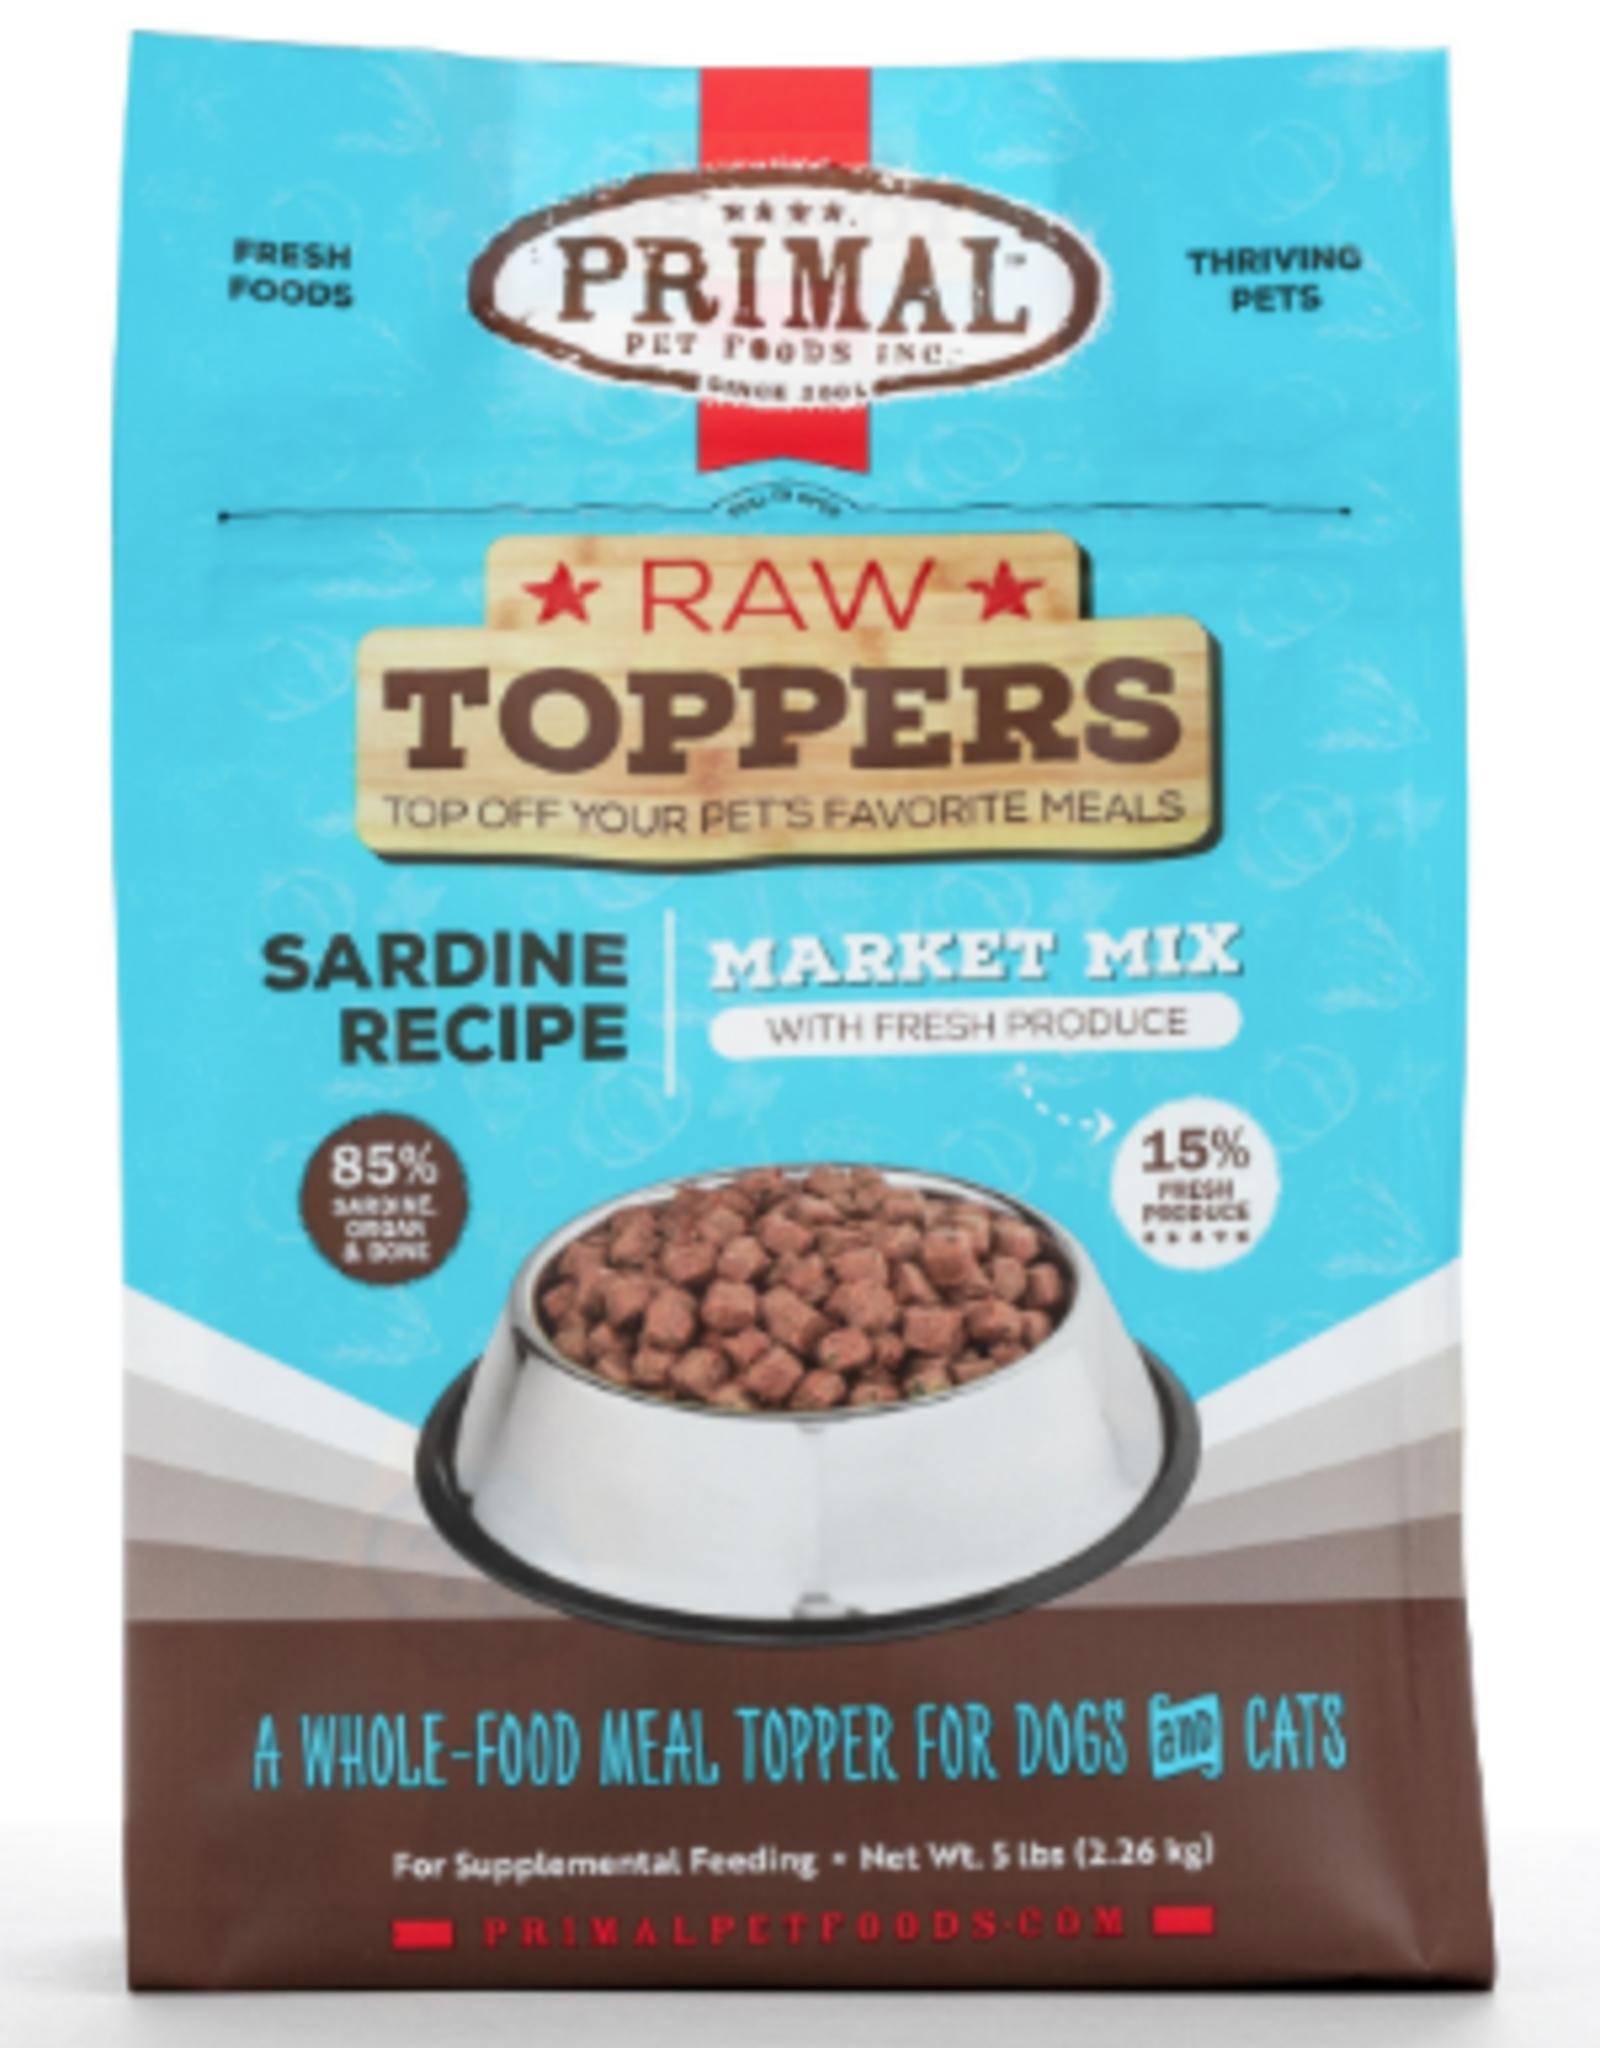 Primal Market Mix Raw Toppers Sardine, 5 oz.